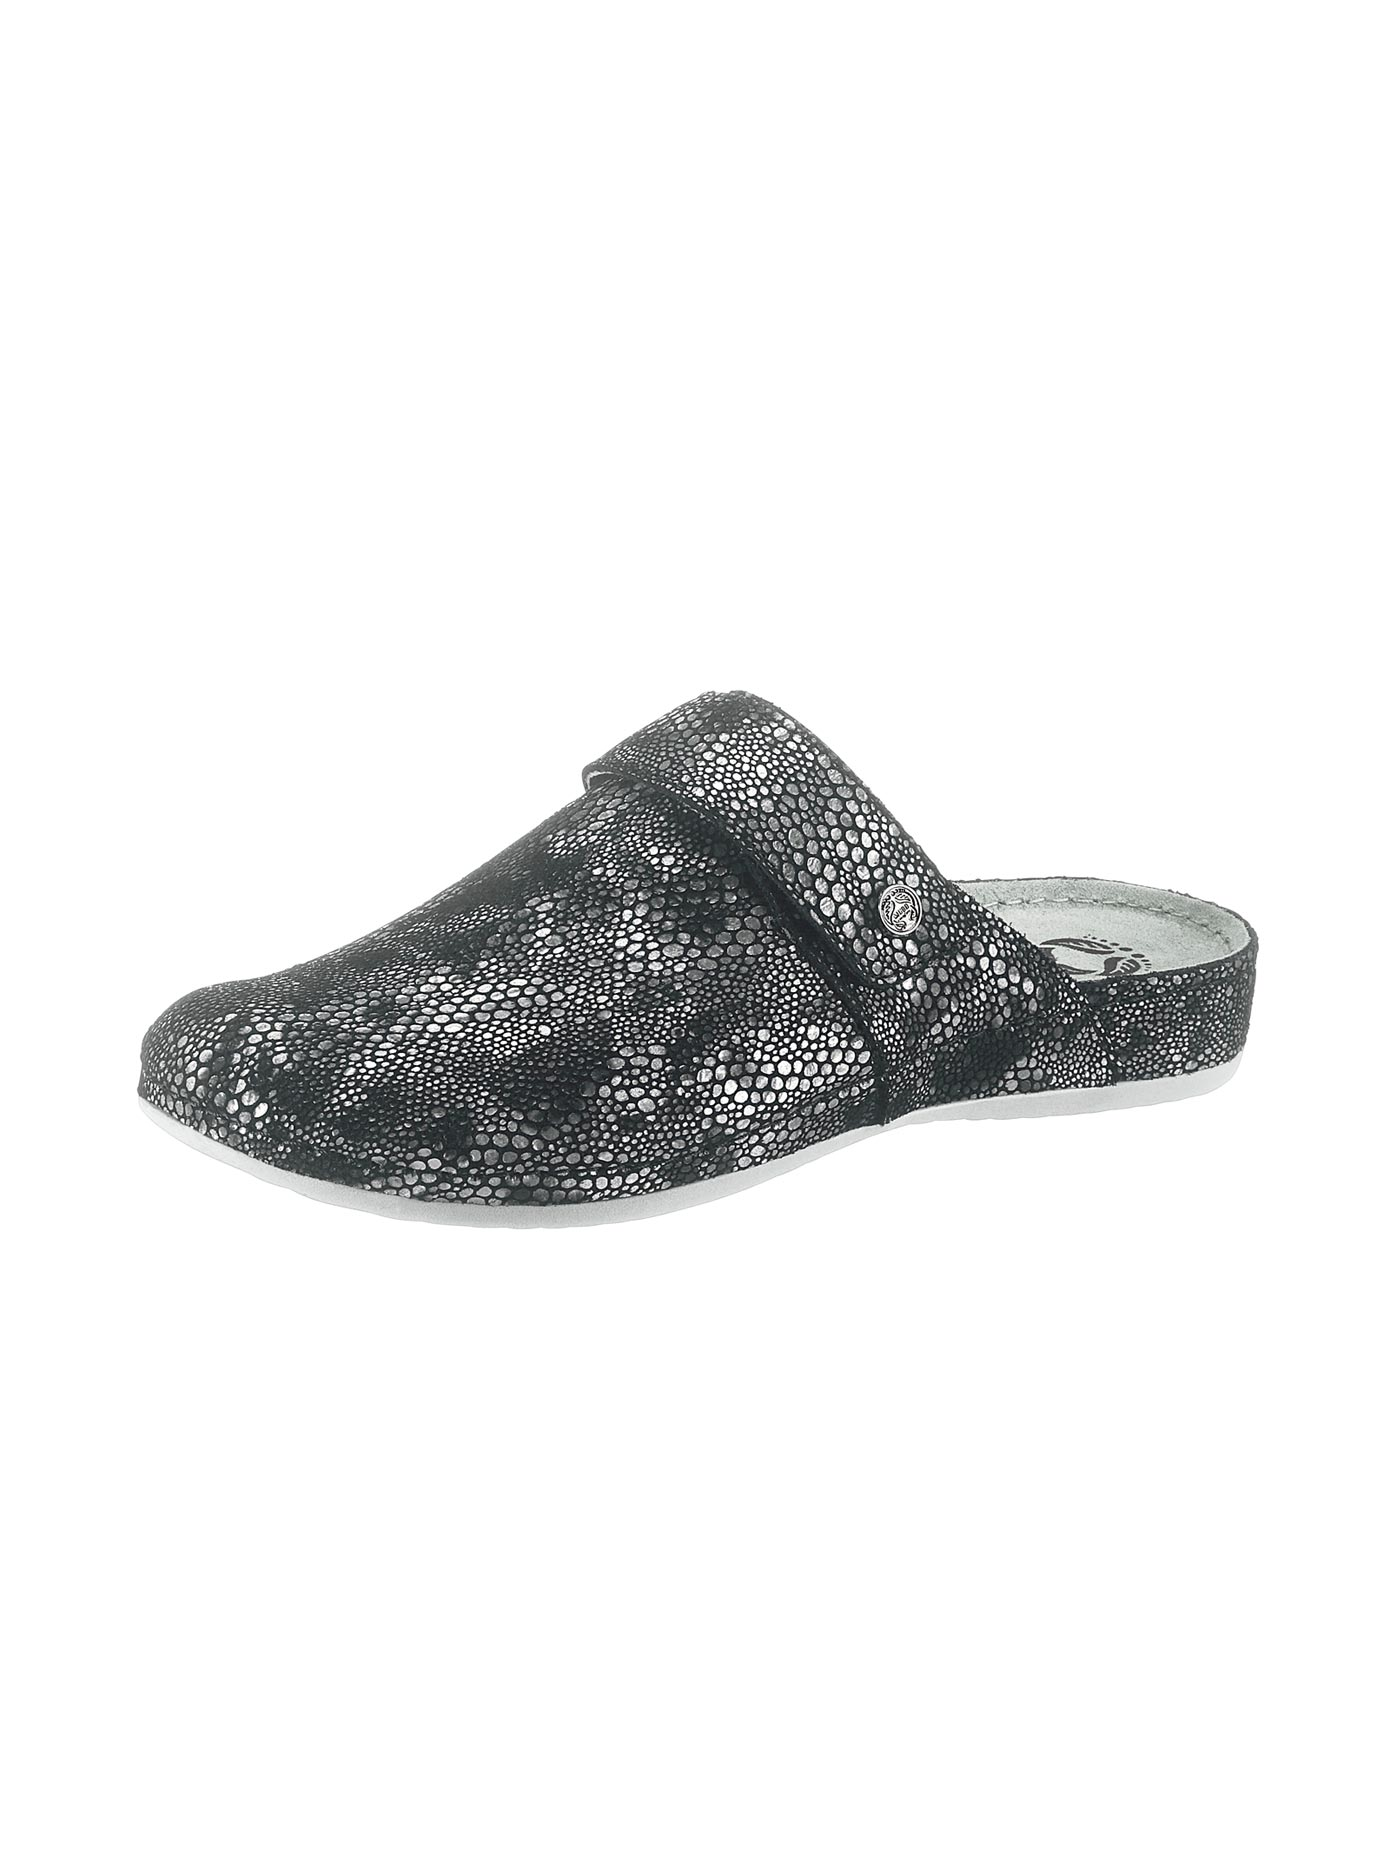 Mubb Clogs in Metallic-Optik | Schuhe > Clogs & Pantoletten > Clogs | Schwarz | Mubb